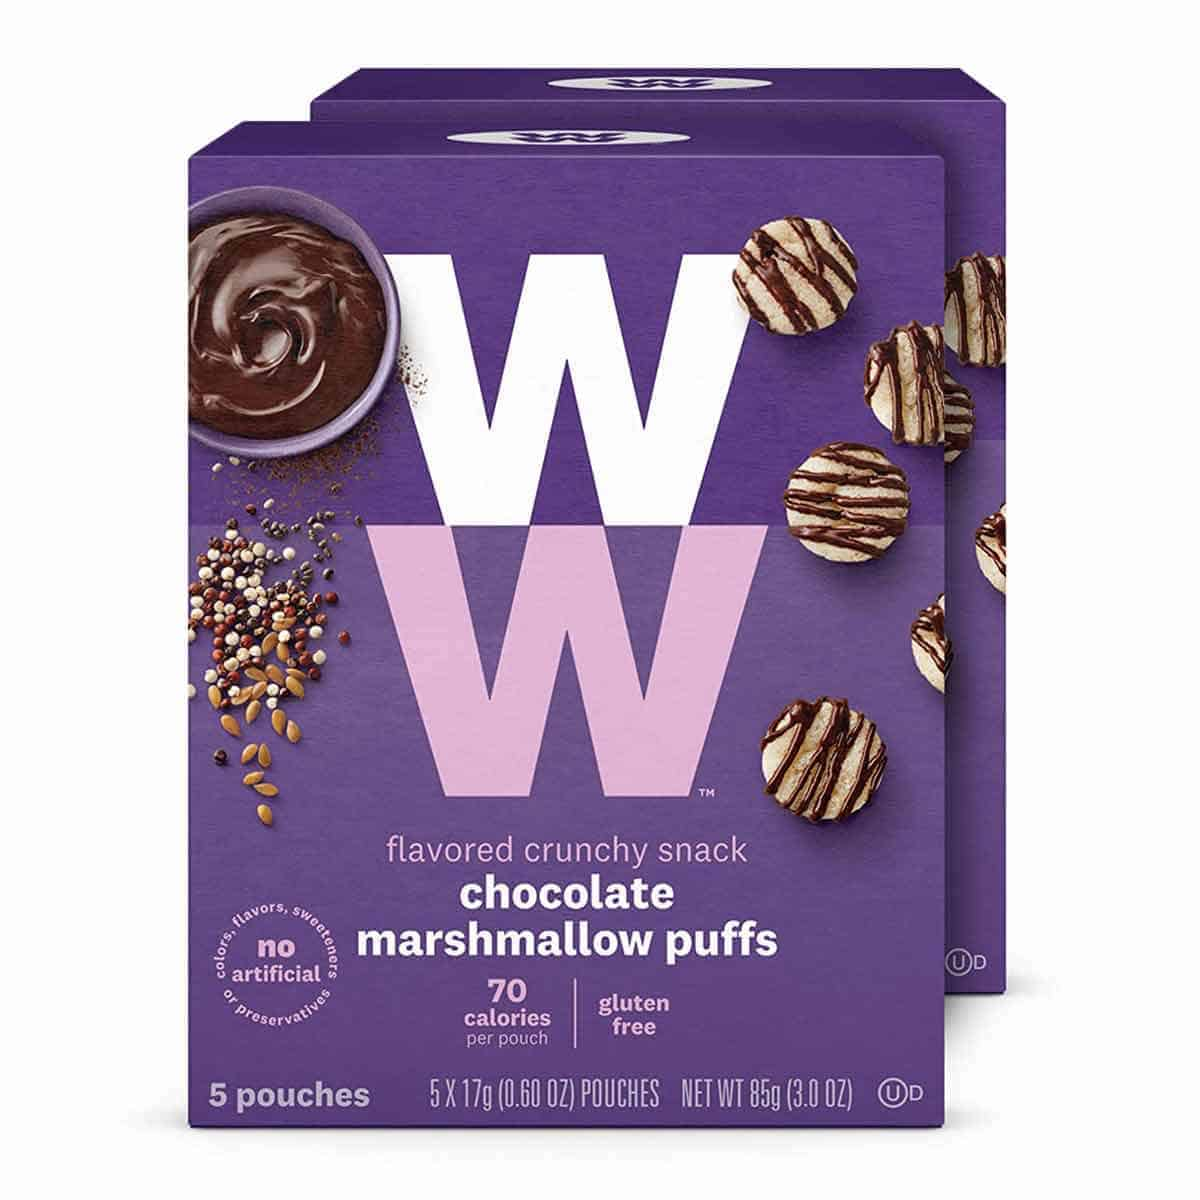 A box of WW Chocolate Marshmallow Puffs